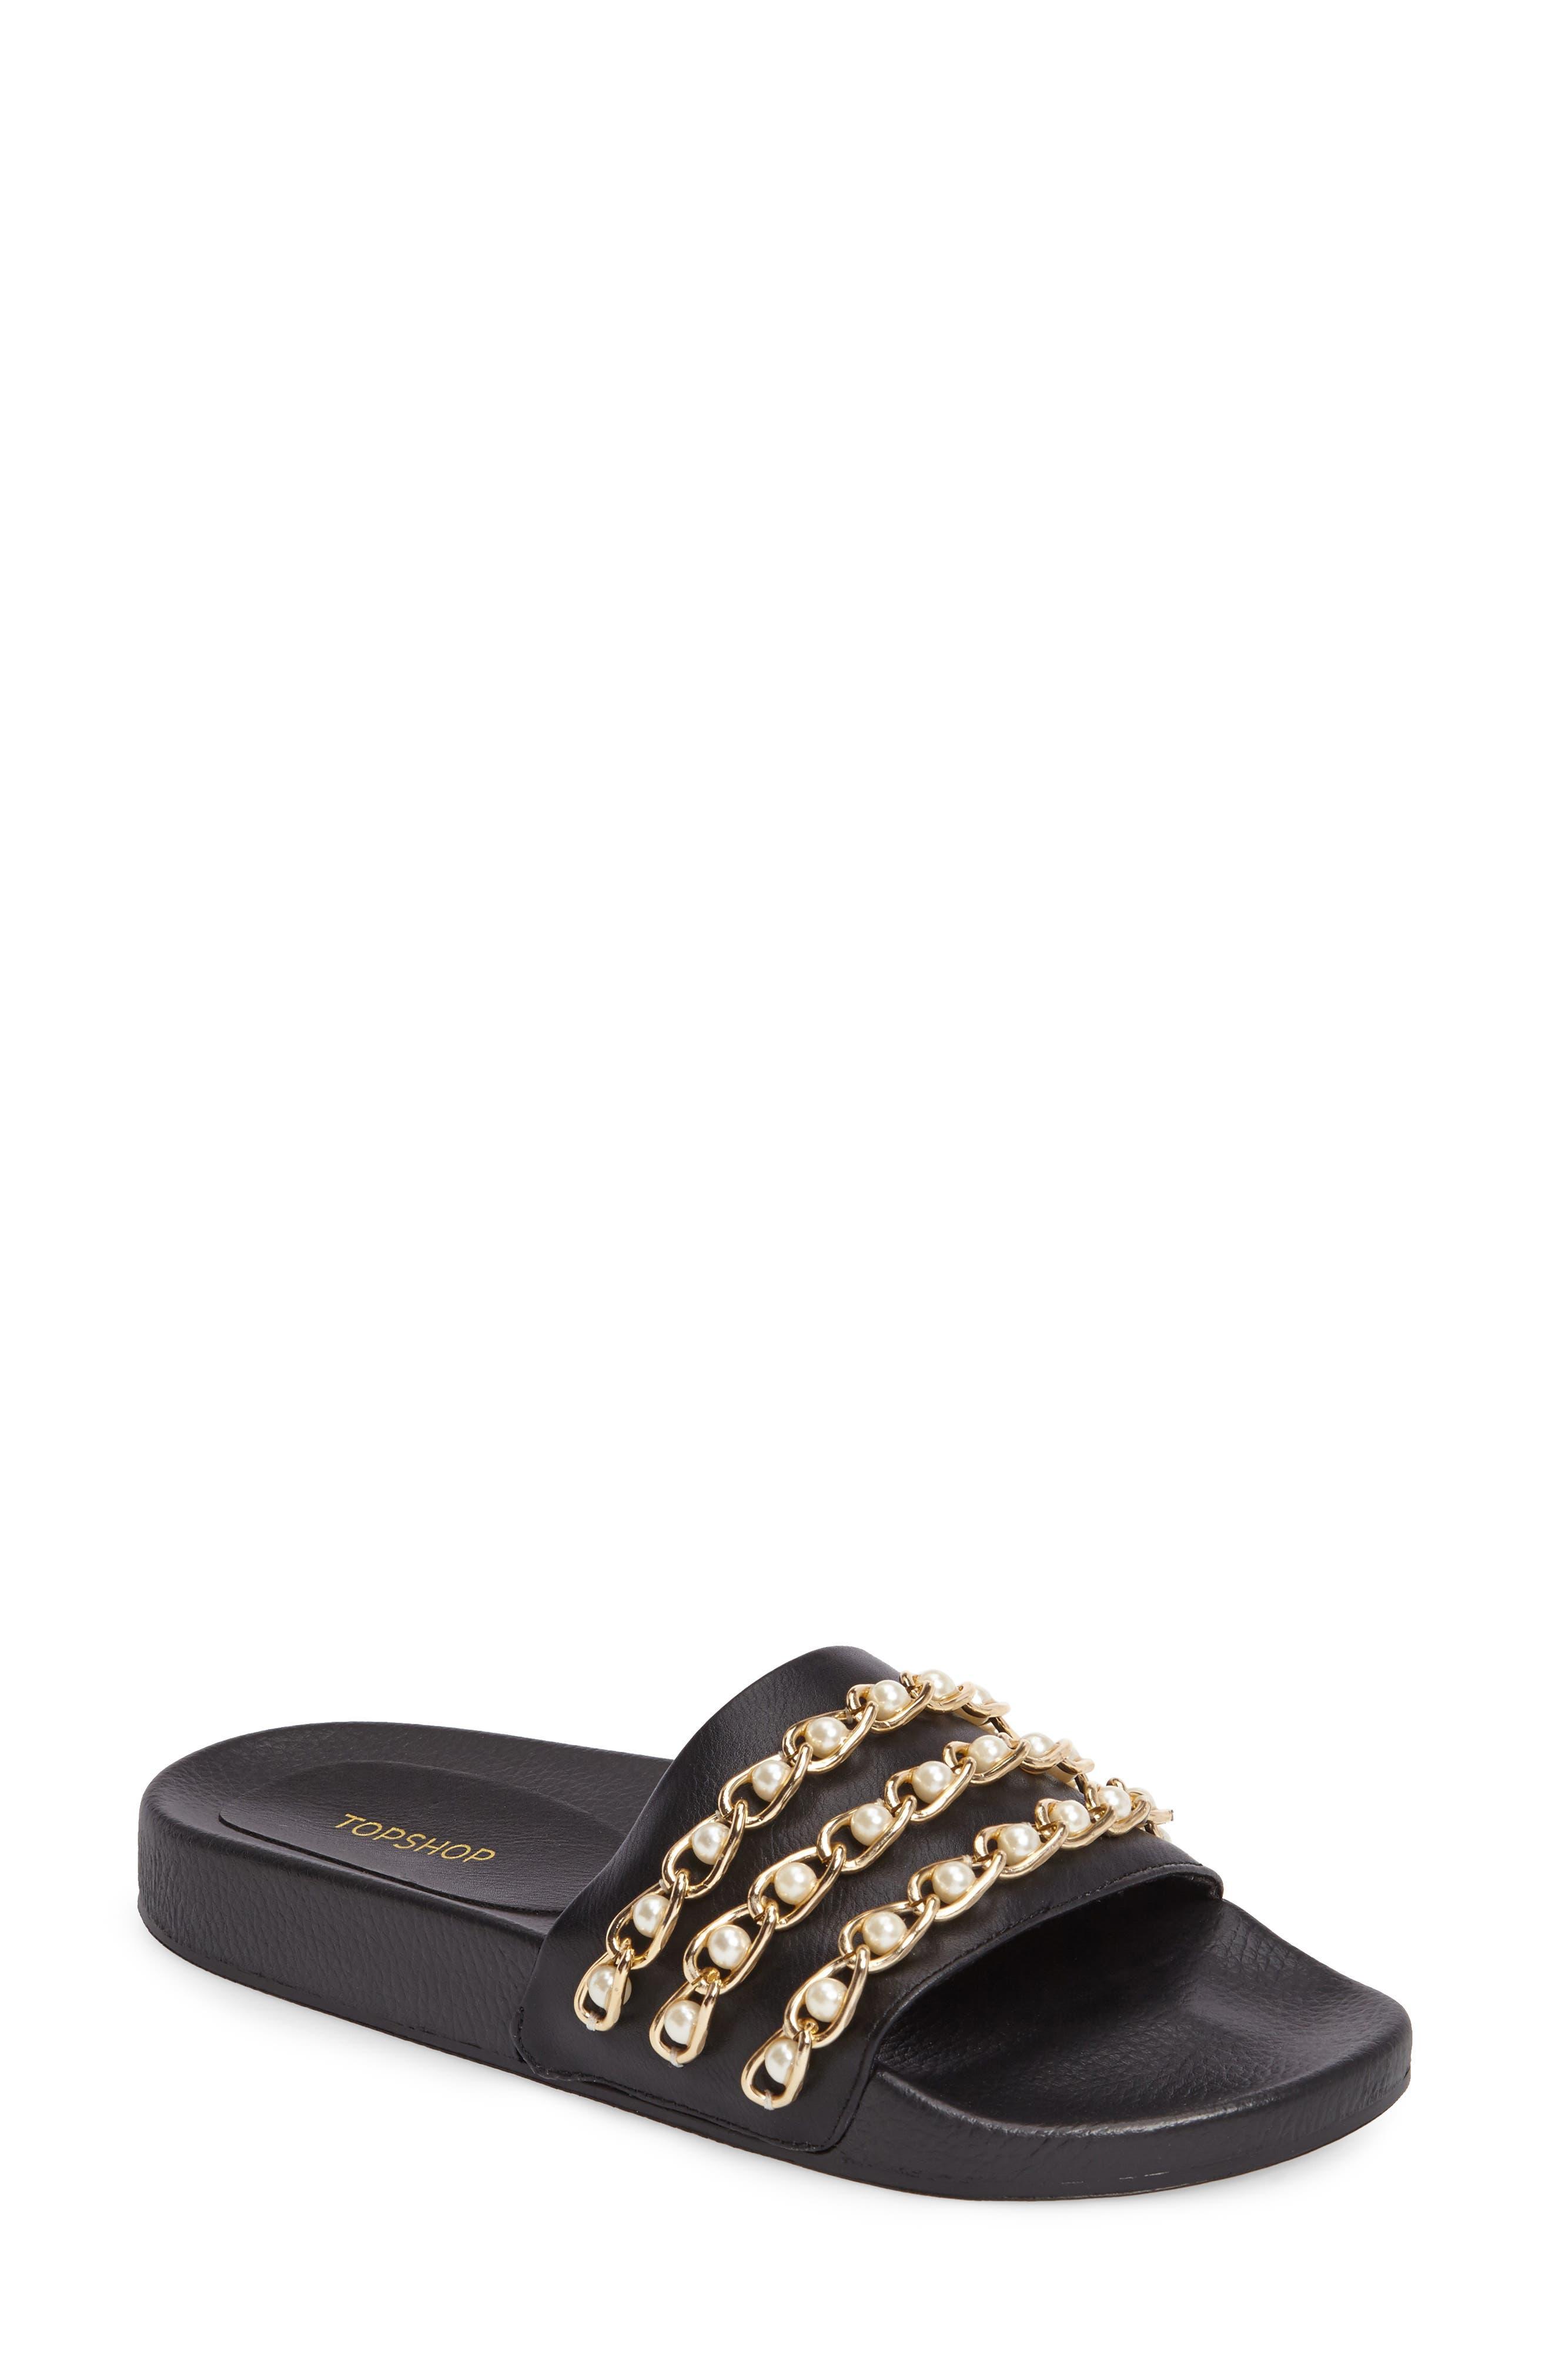 Hottie Pearl Chain Slide Sandal,                             Main thumbnail 1, color,                             Black Multi